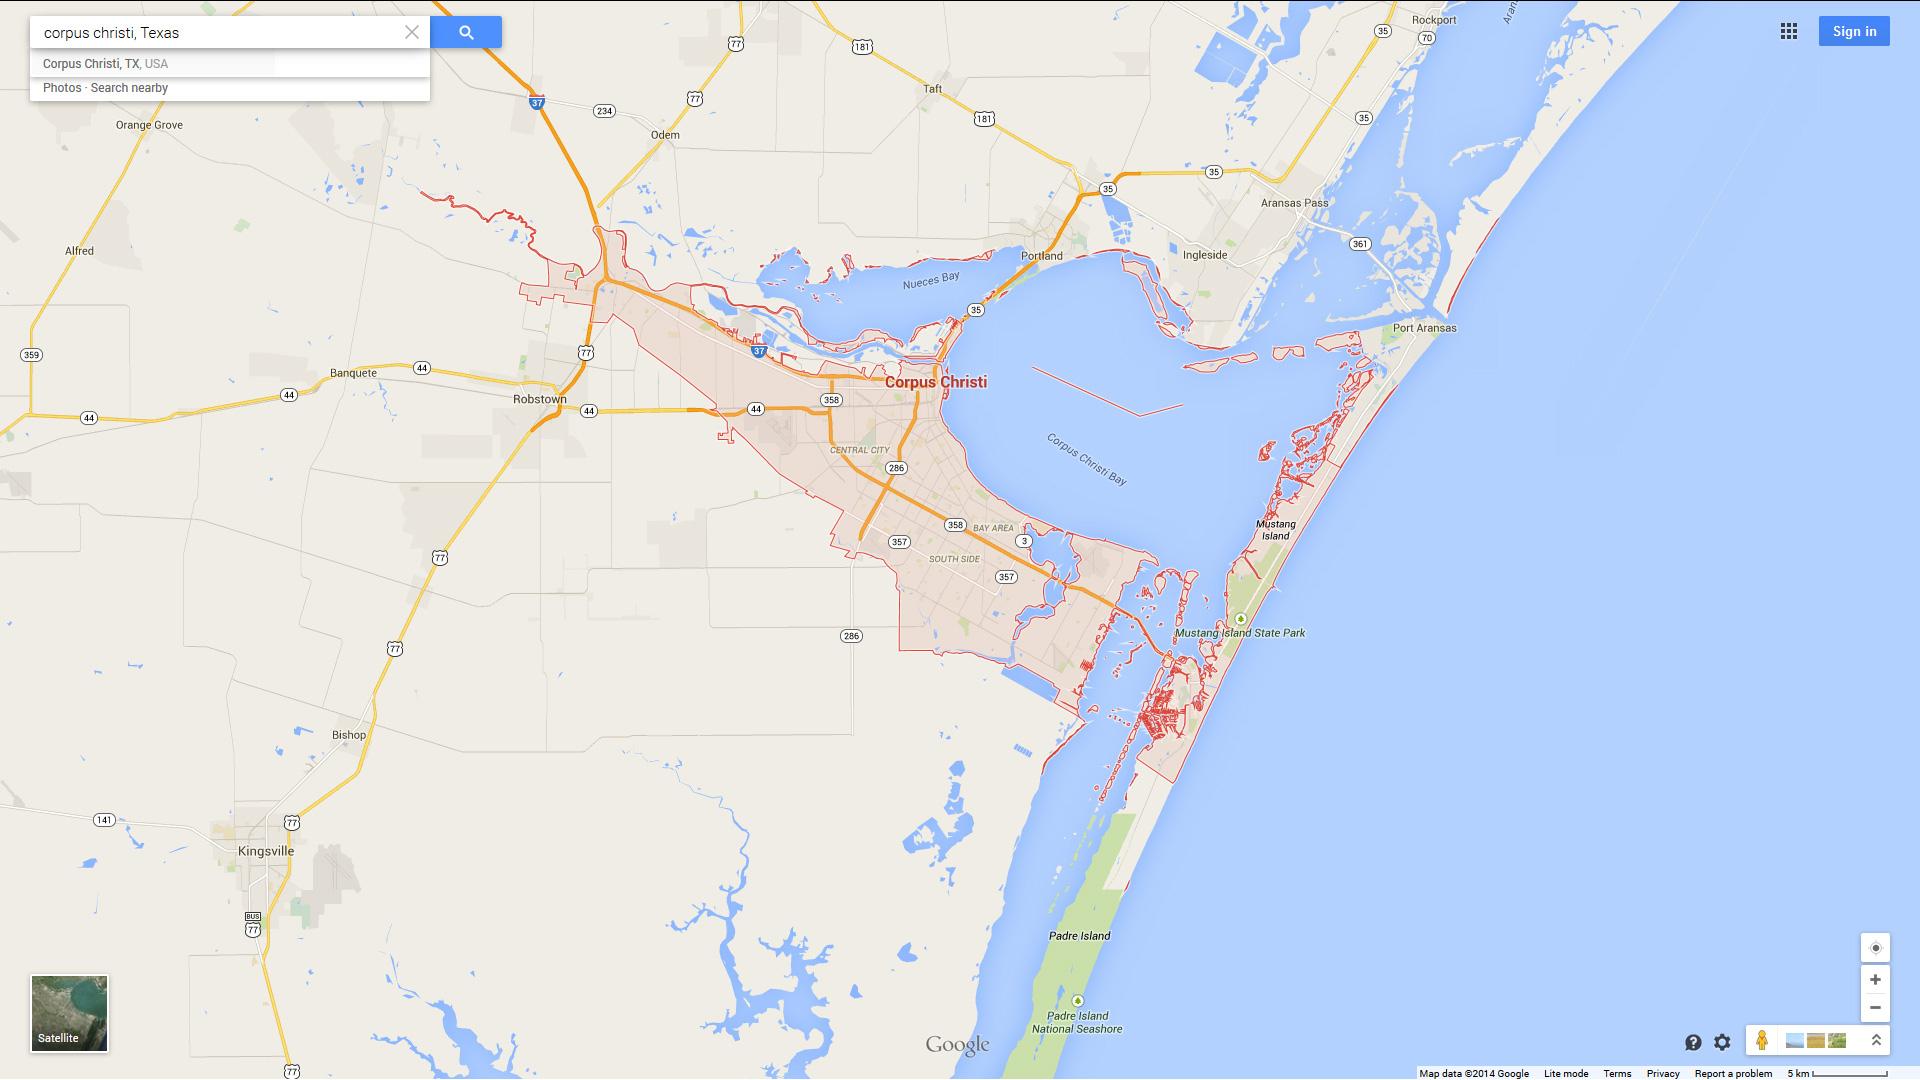 Corpus Christi, Texas Map - Google Maps Corpus Christi Texas